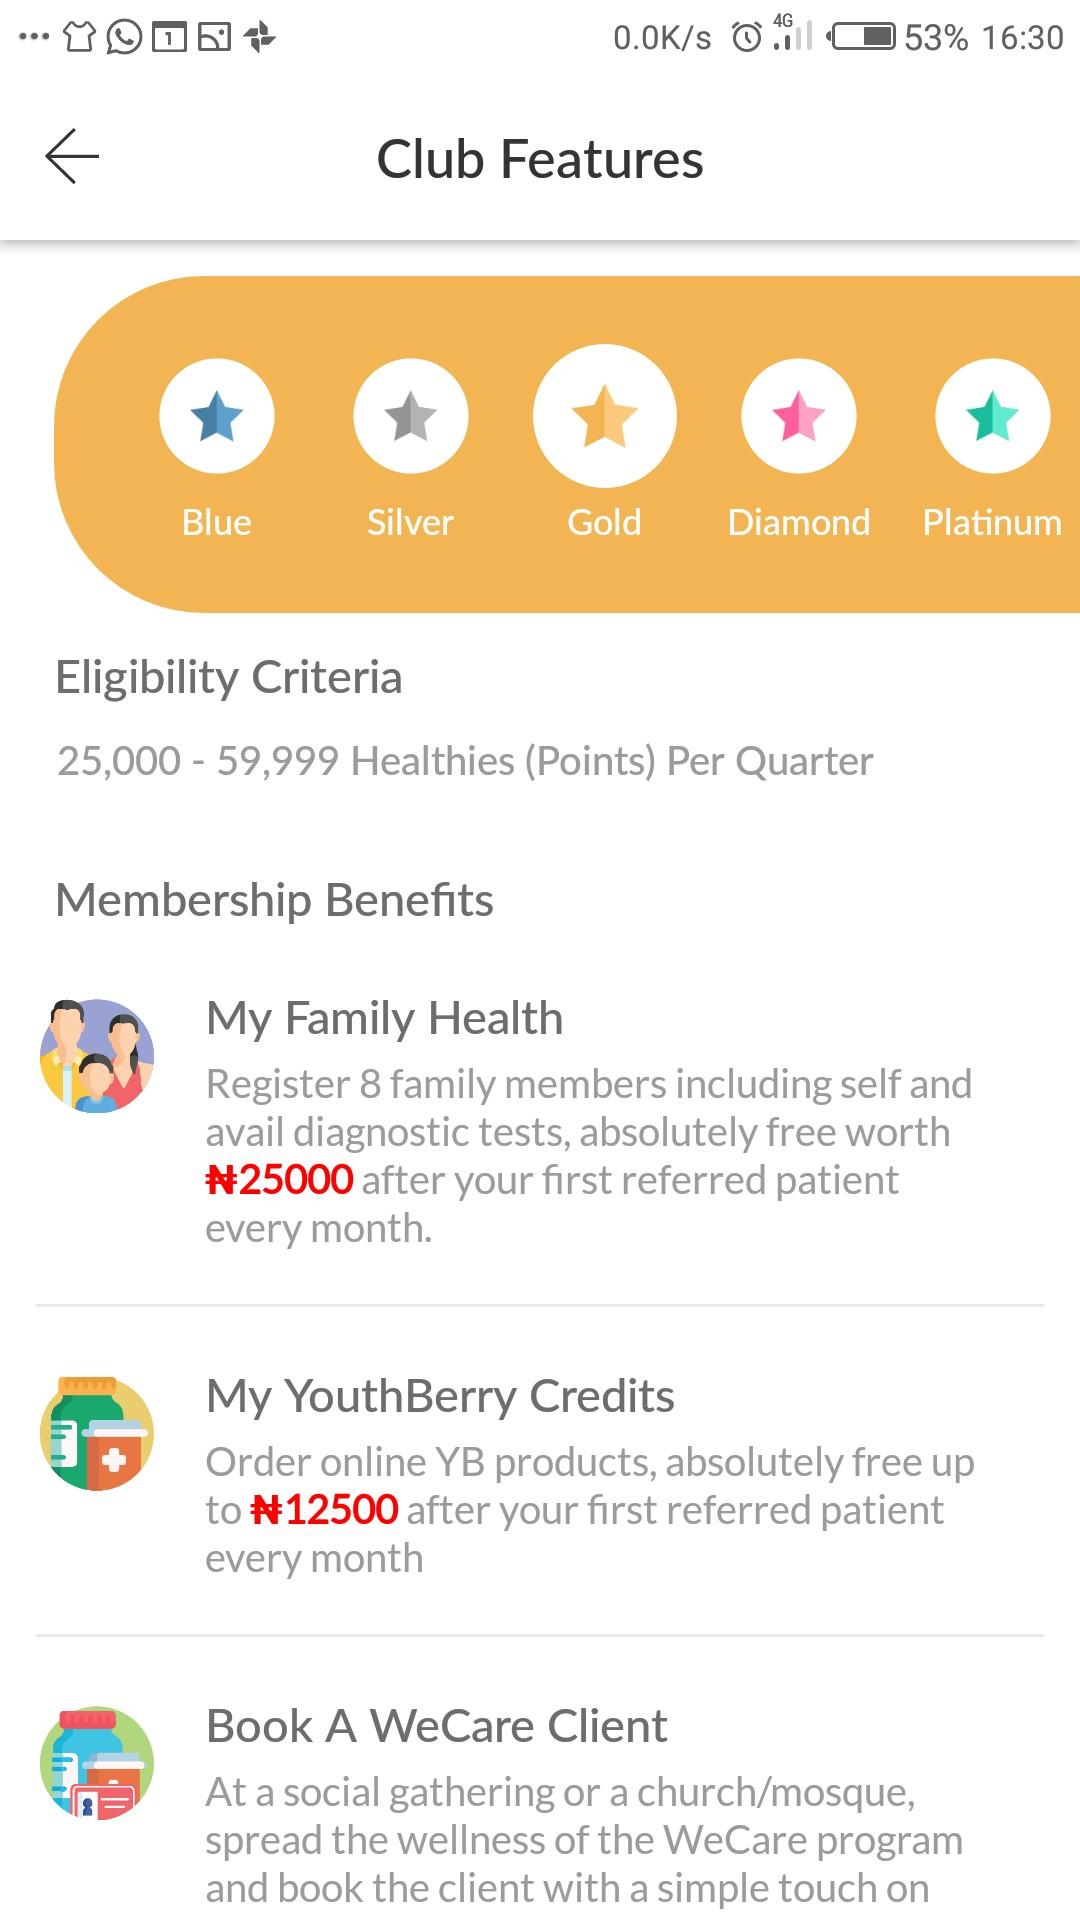 Gold Club Membership